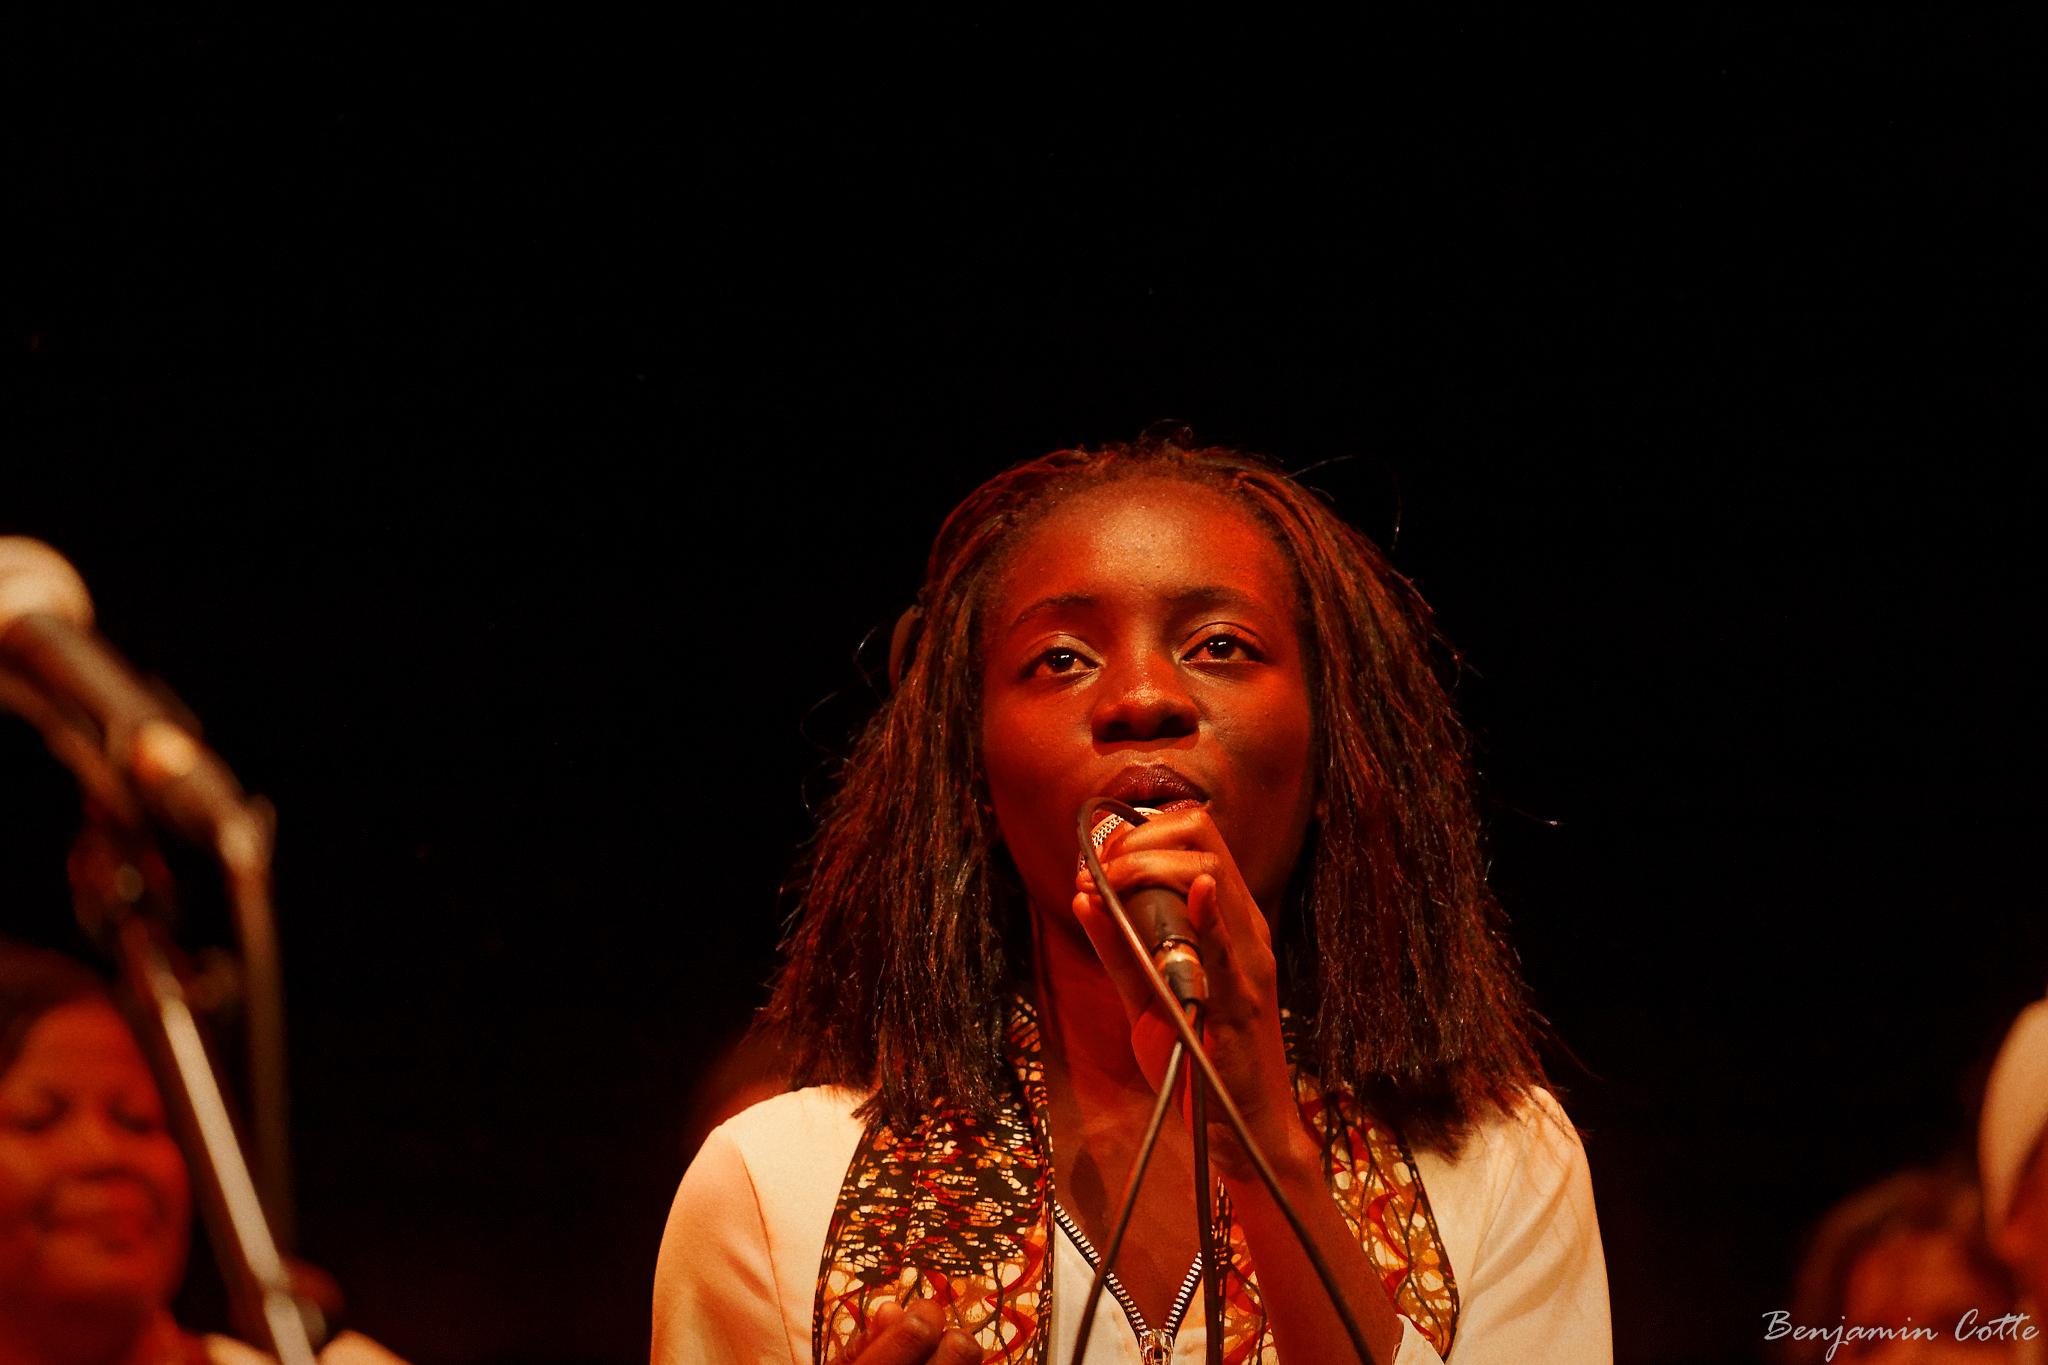 Avec conviction Théodora chante